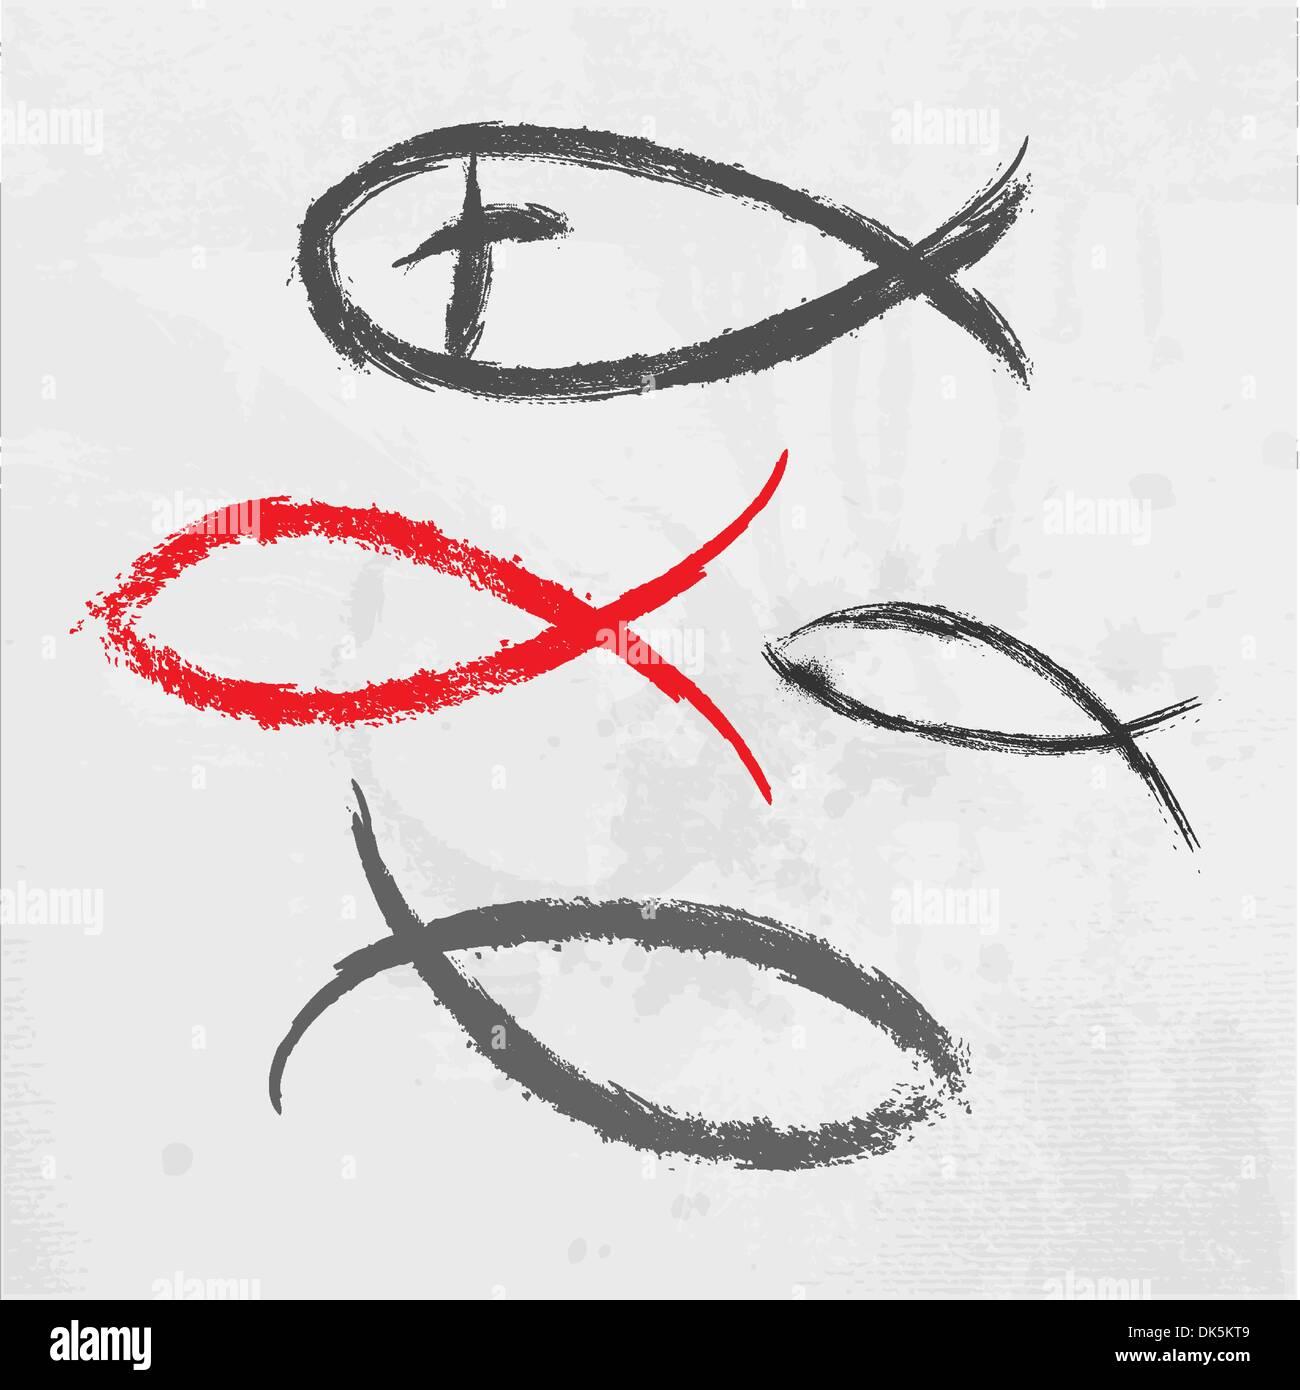 Ichthus Symbol Stockfotos & Ichthus Symbol Bilder - Alamy